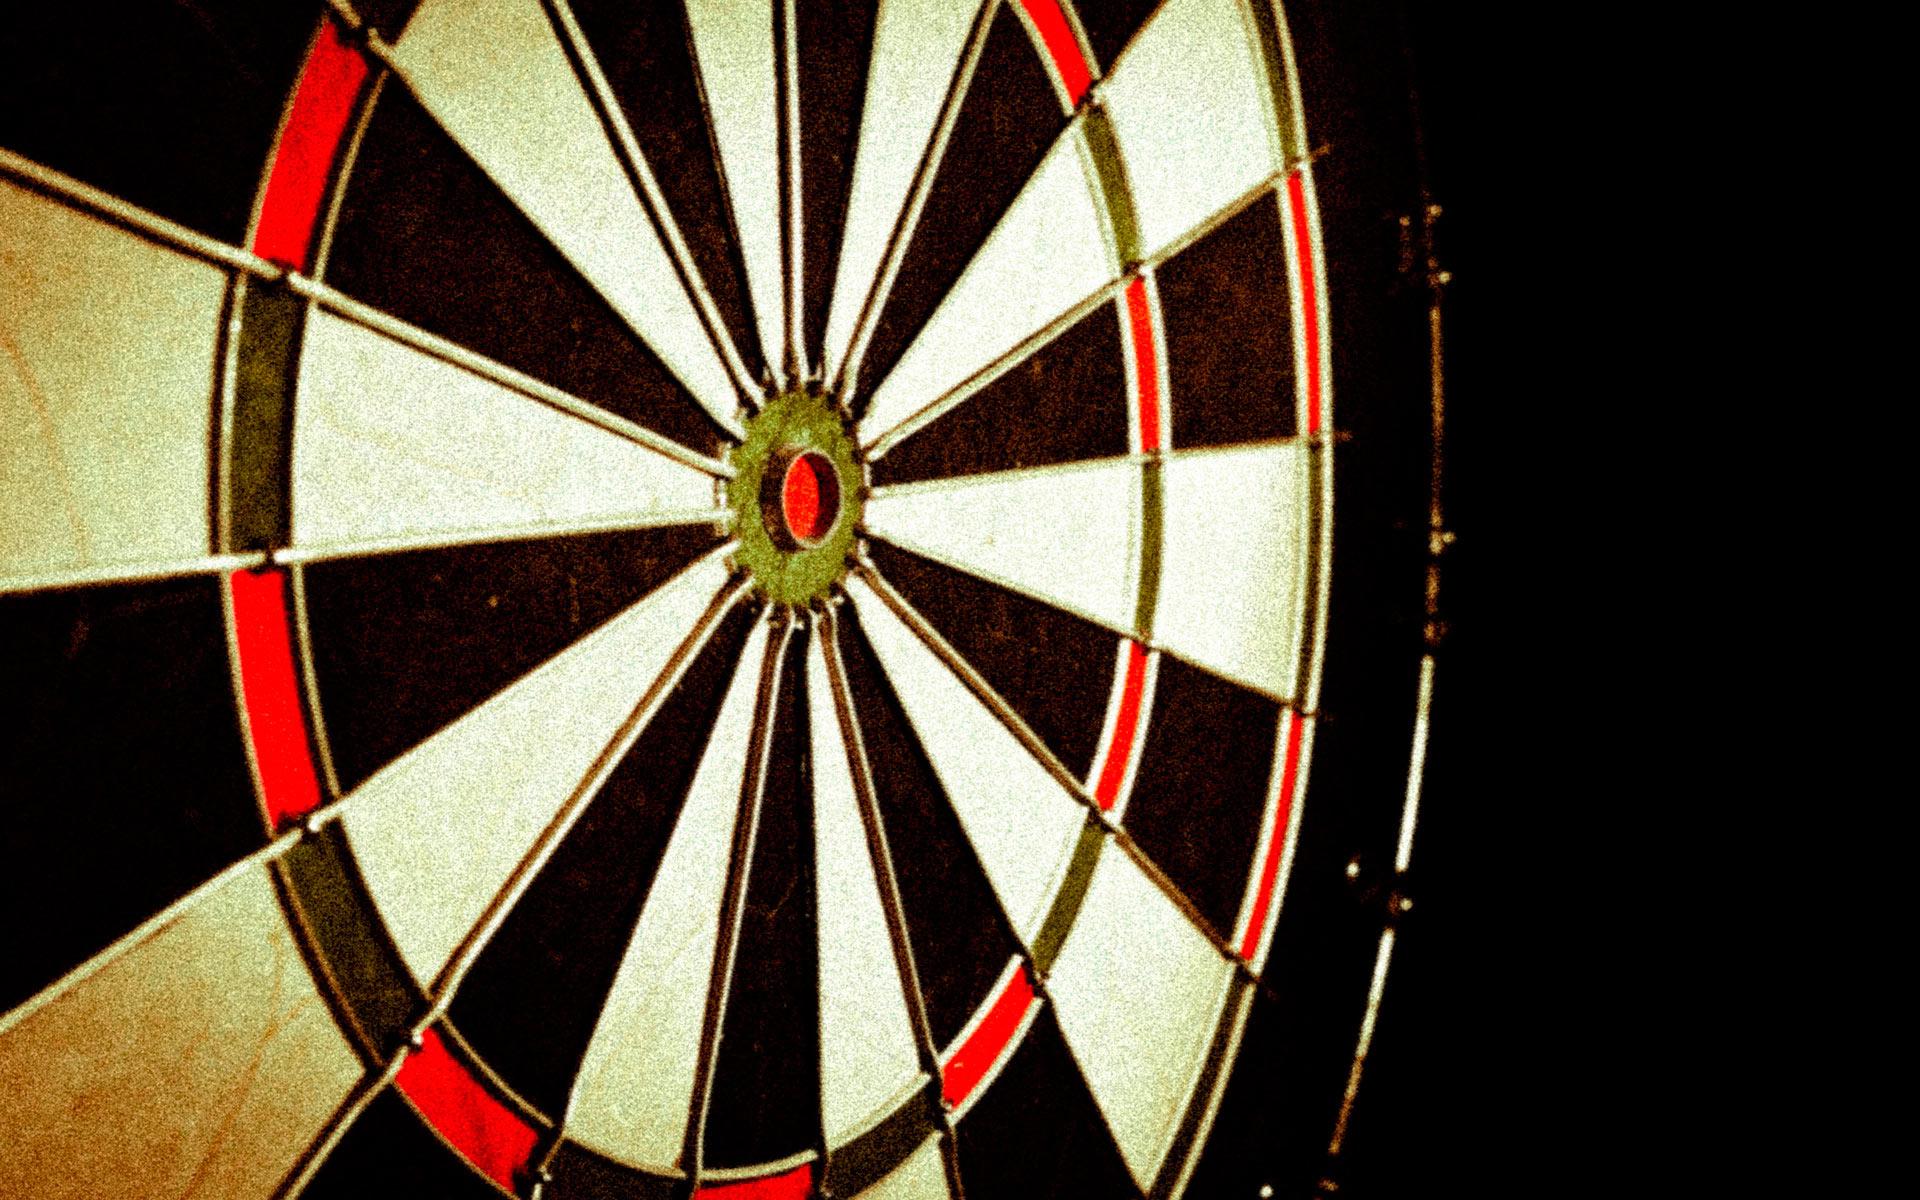 dart board hd wallpapers - photo #20